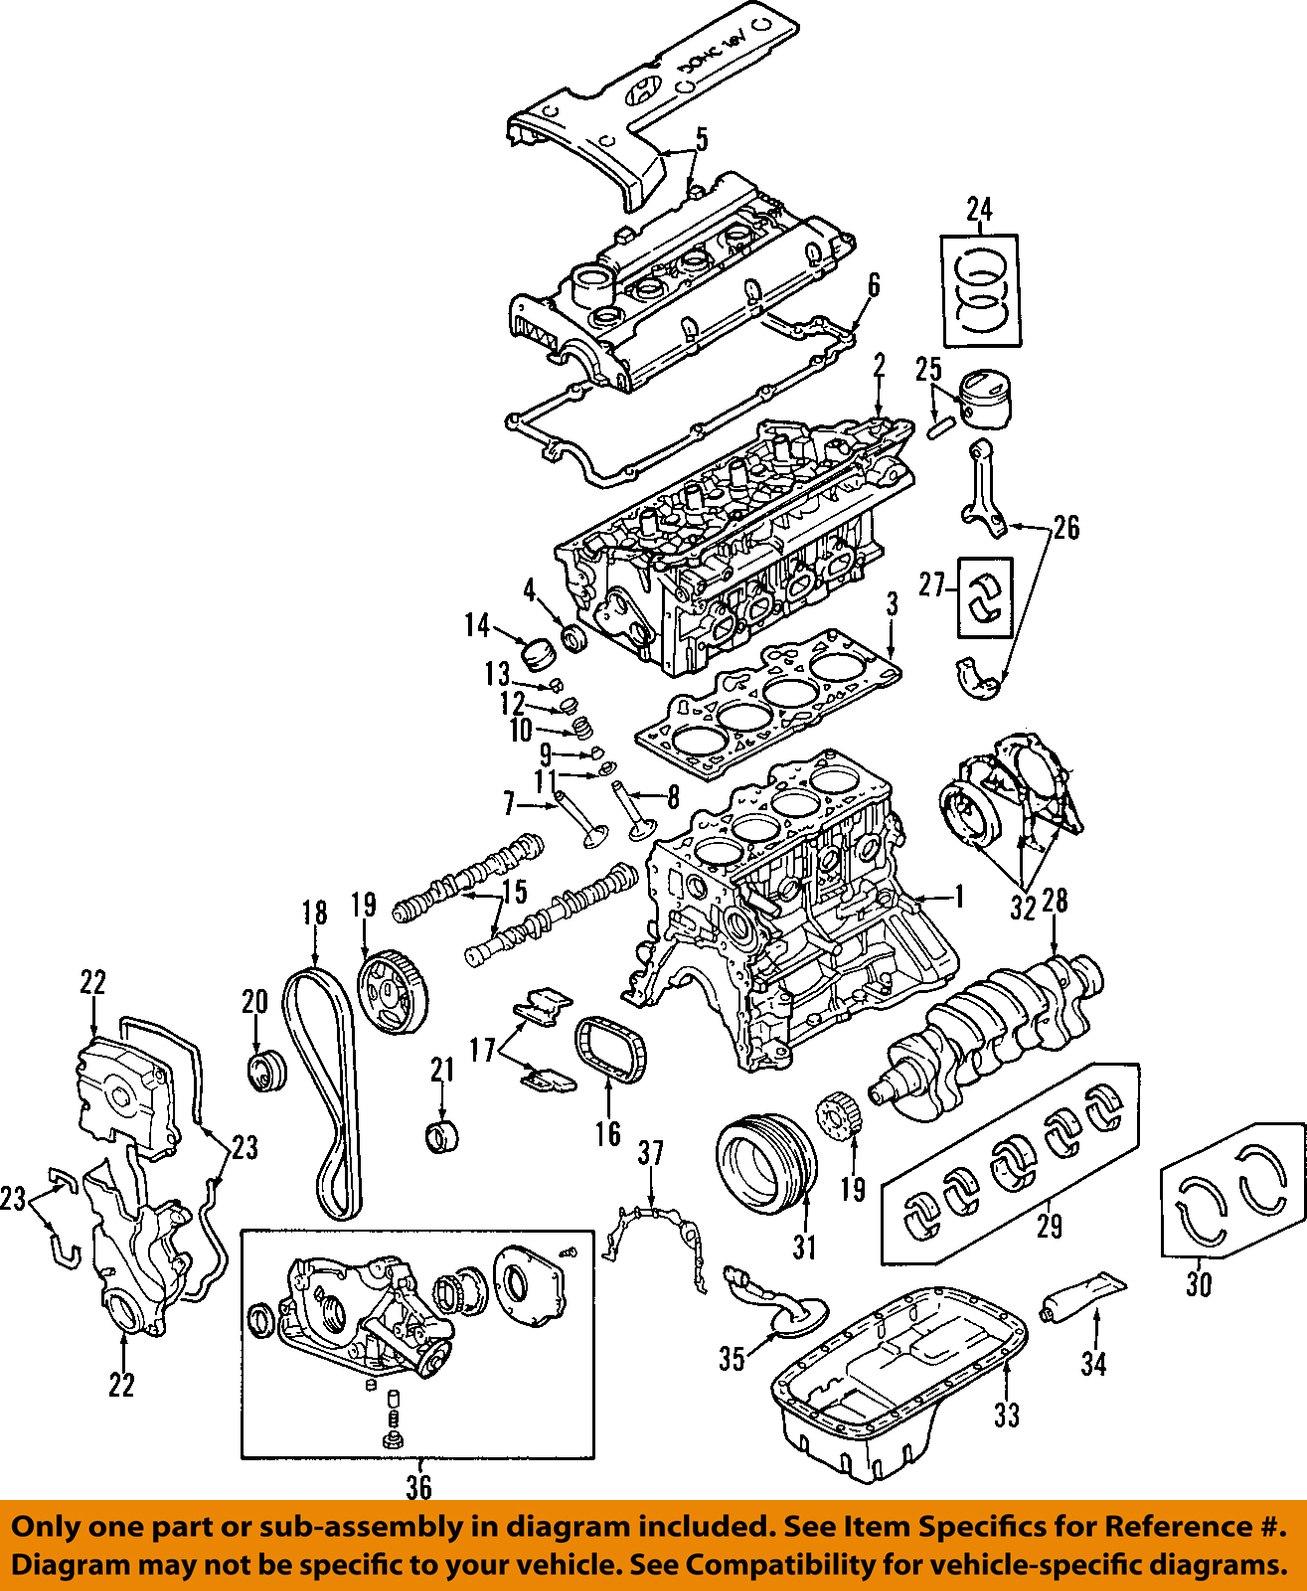 kia oem 04 09 spectra engine timing chain tensioner. Black Bedroom Furniture Sets. Home Design Ideas